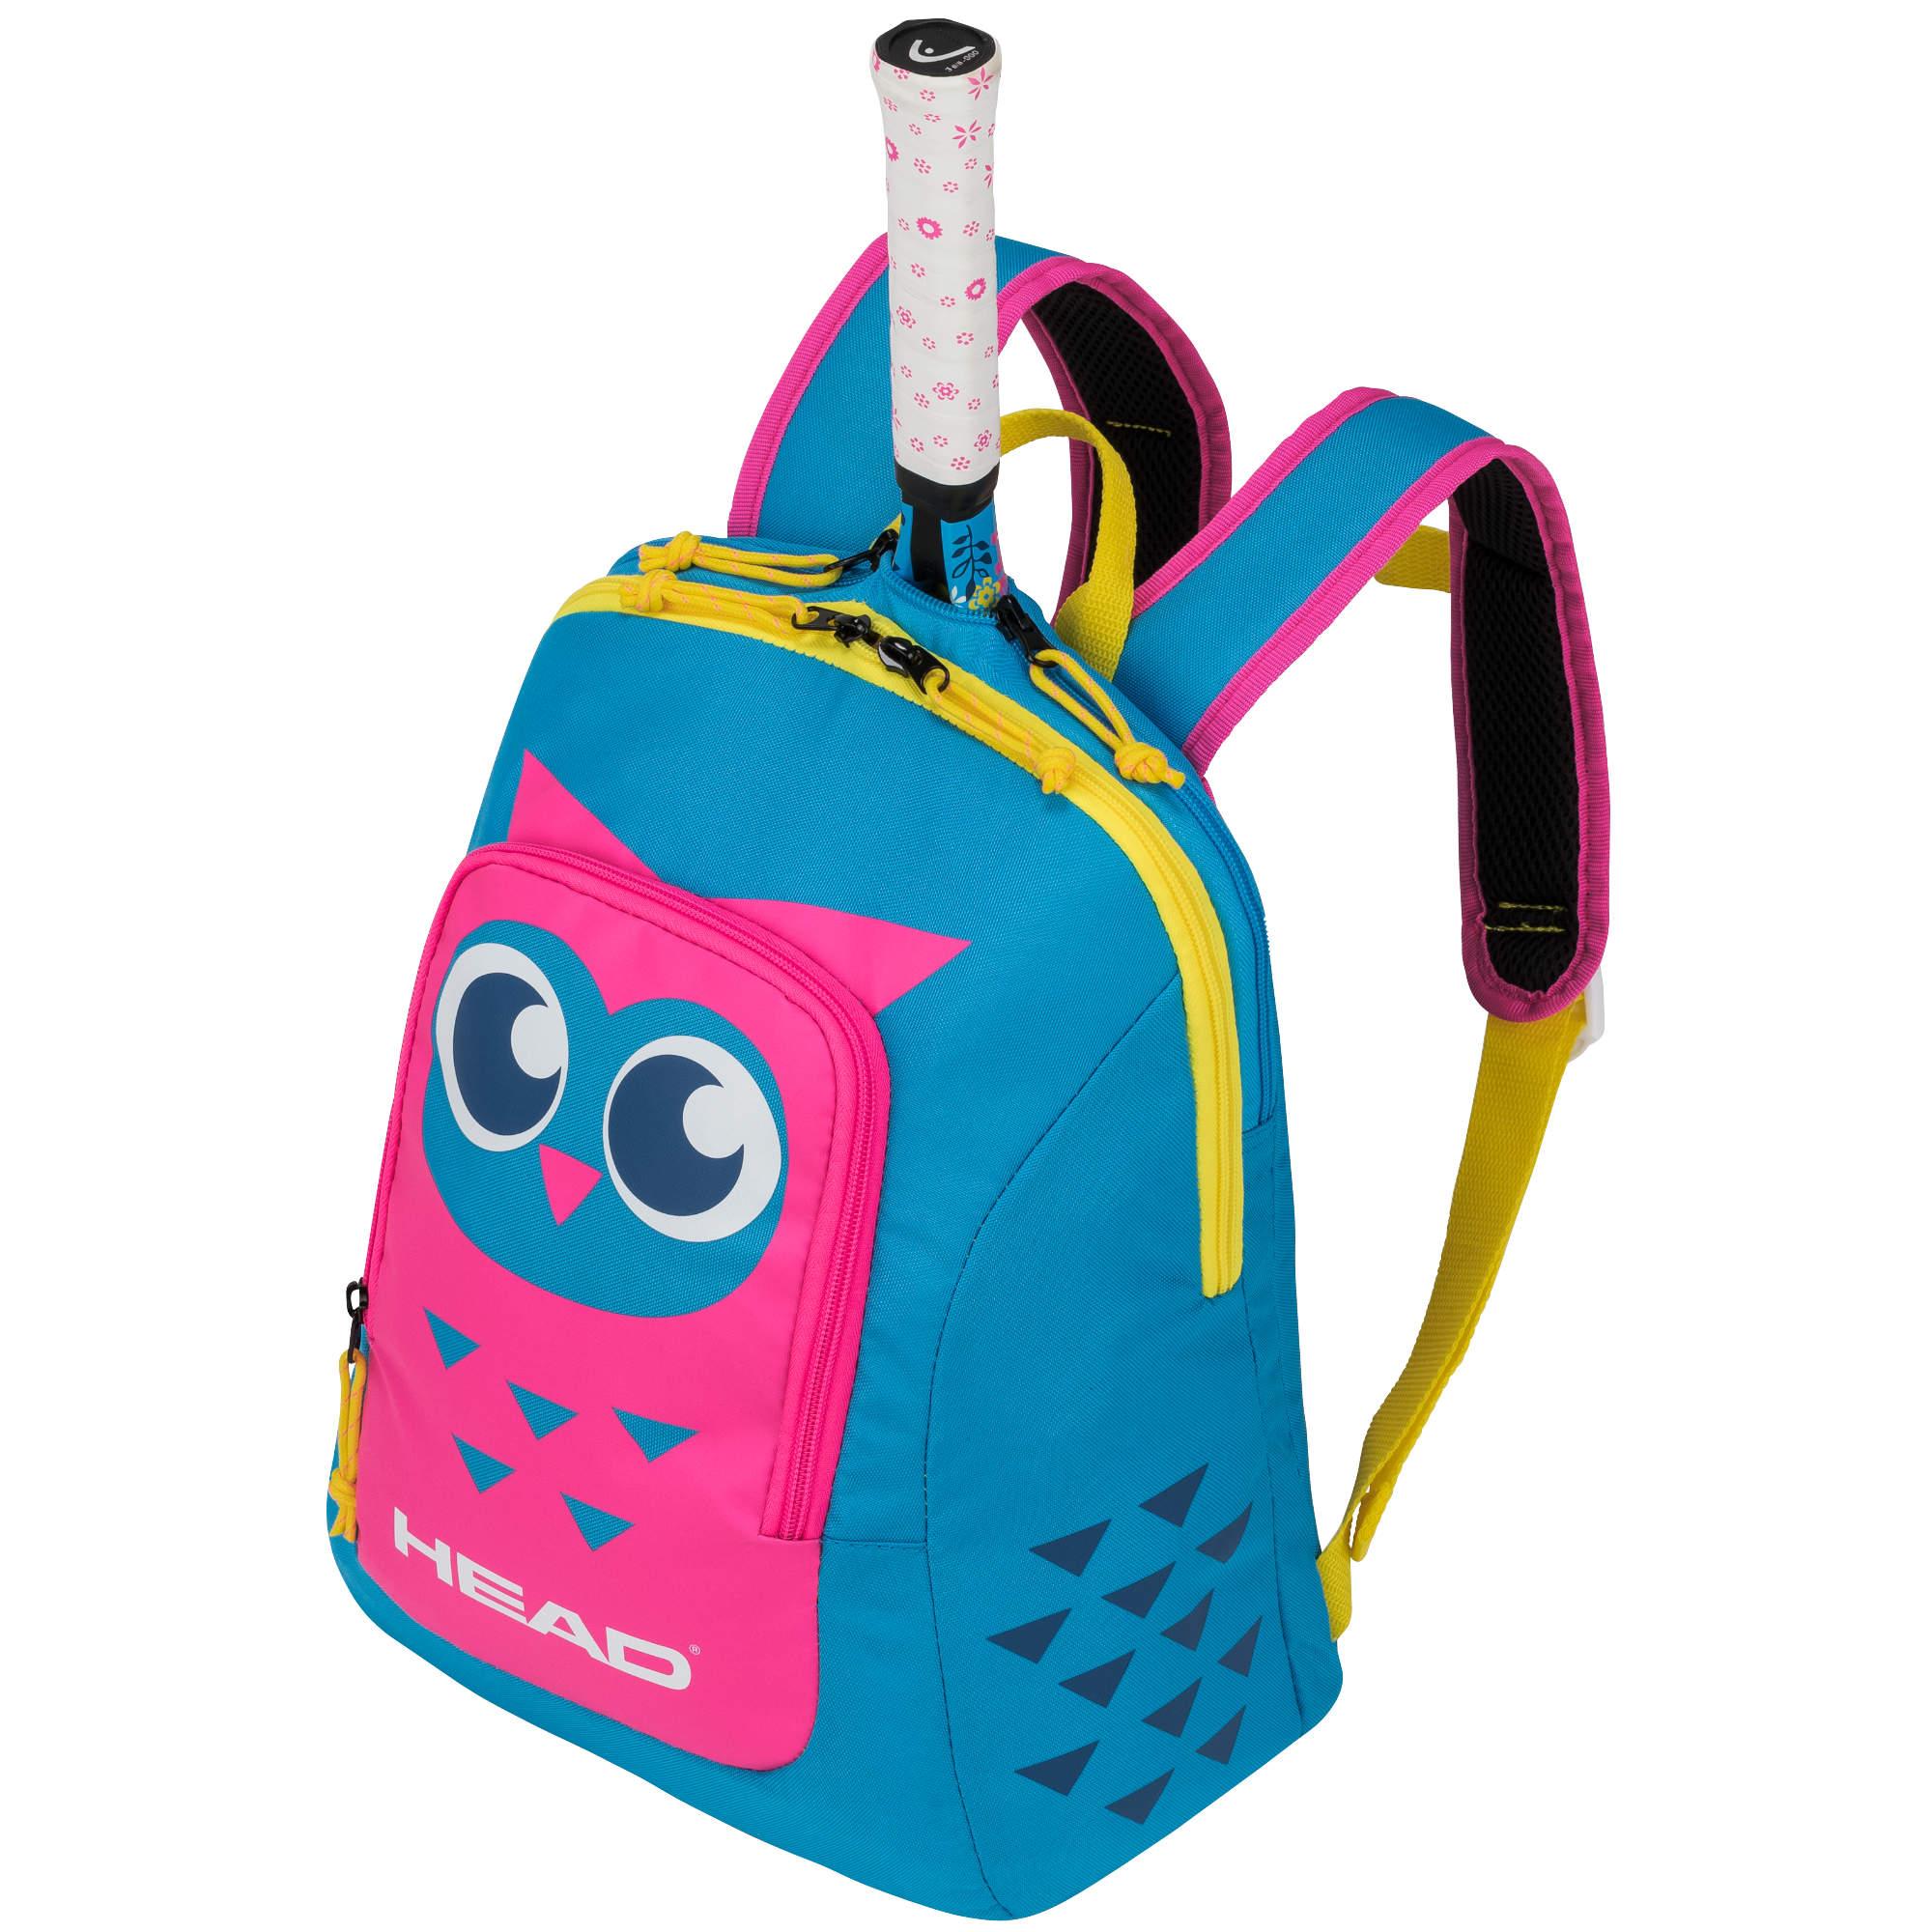 Head Kids Backpack - Blue/Pink